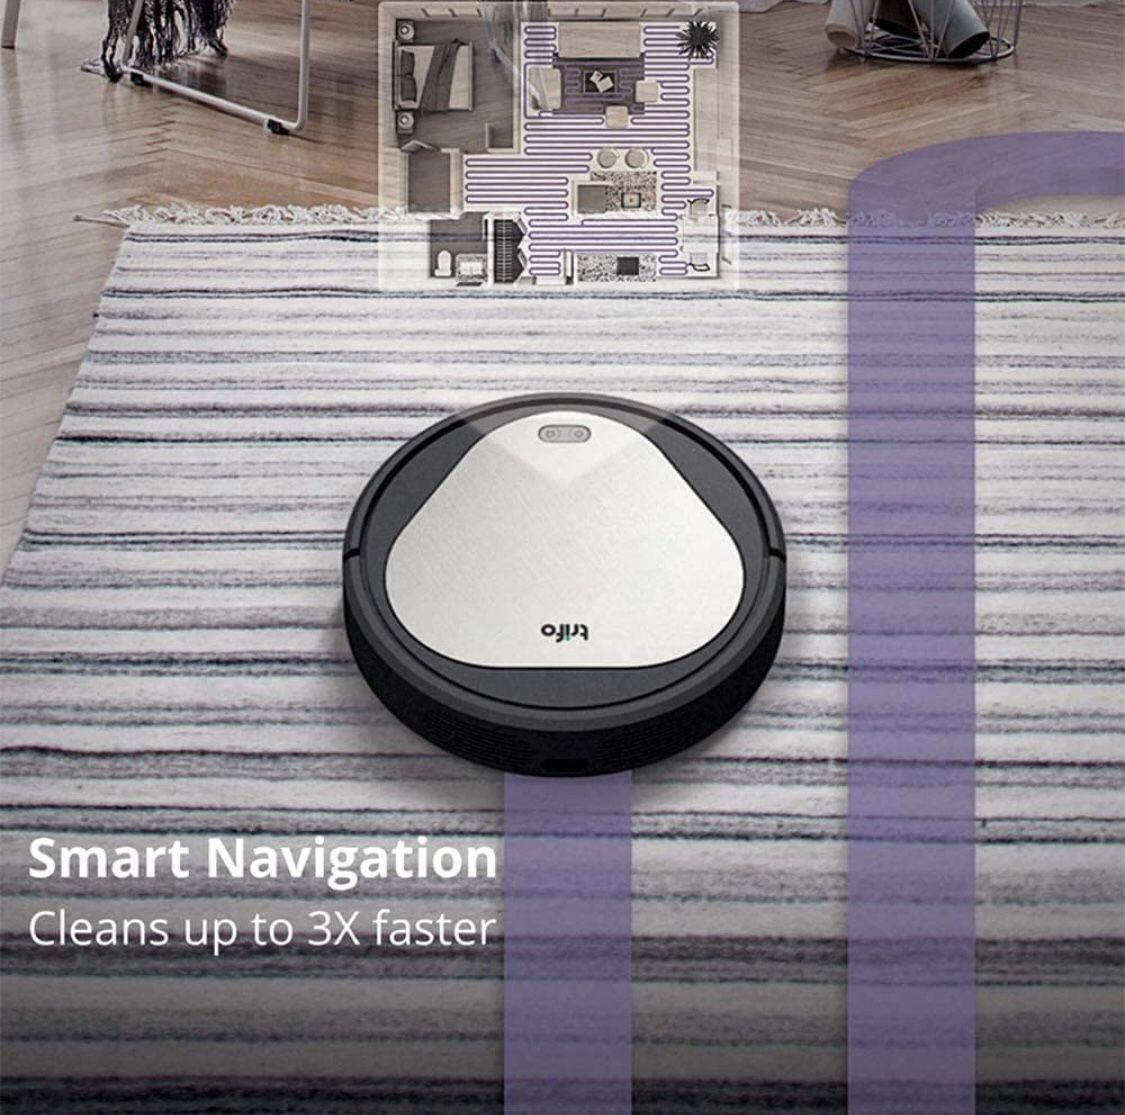 New Robot Vacuum